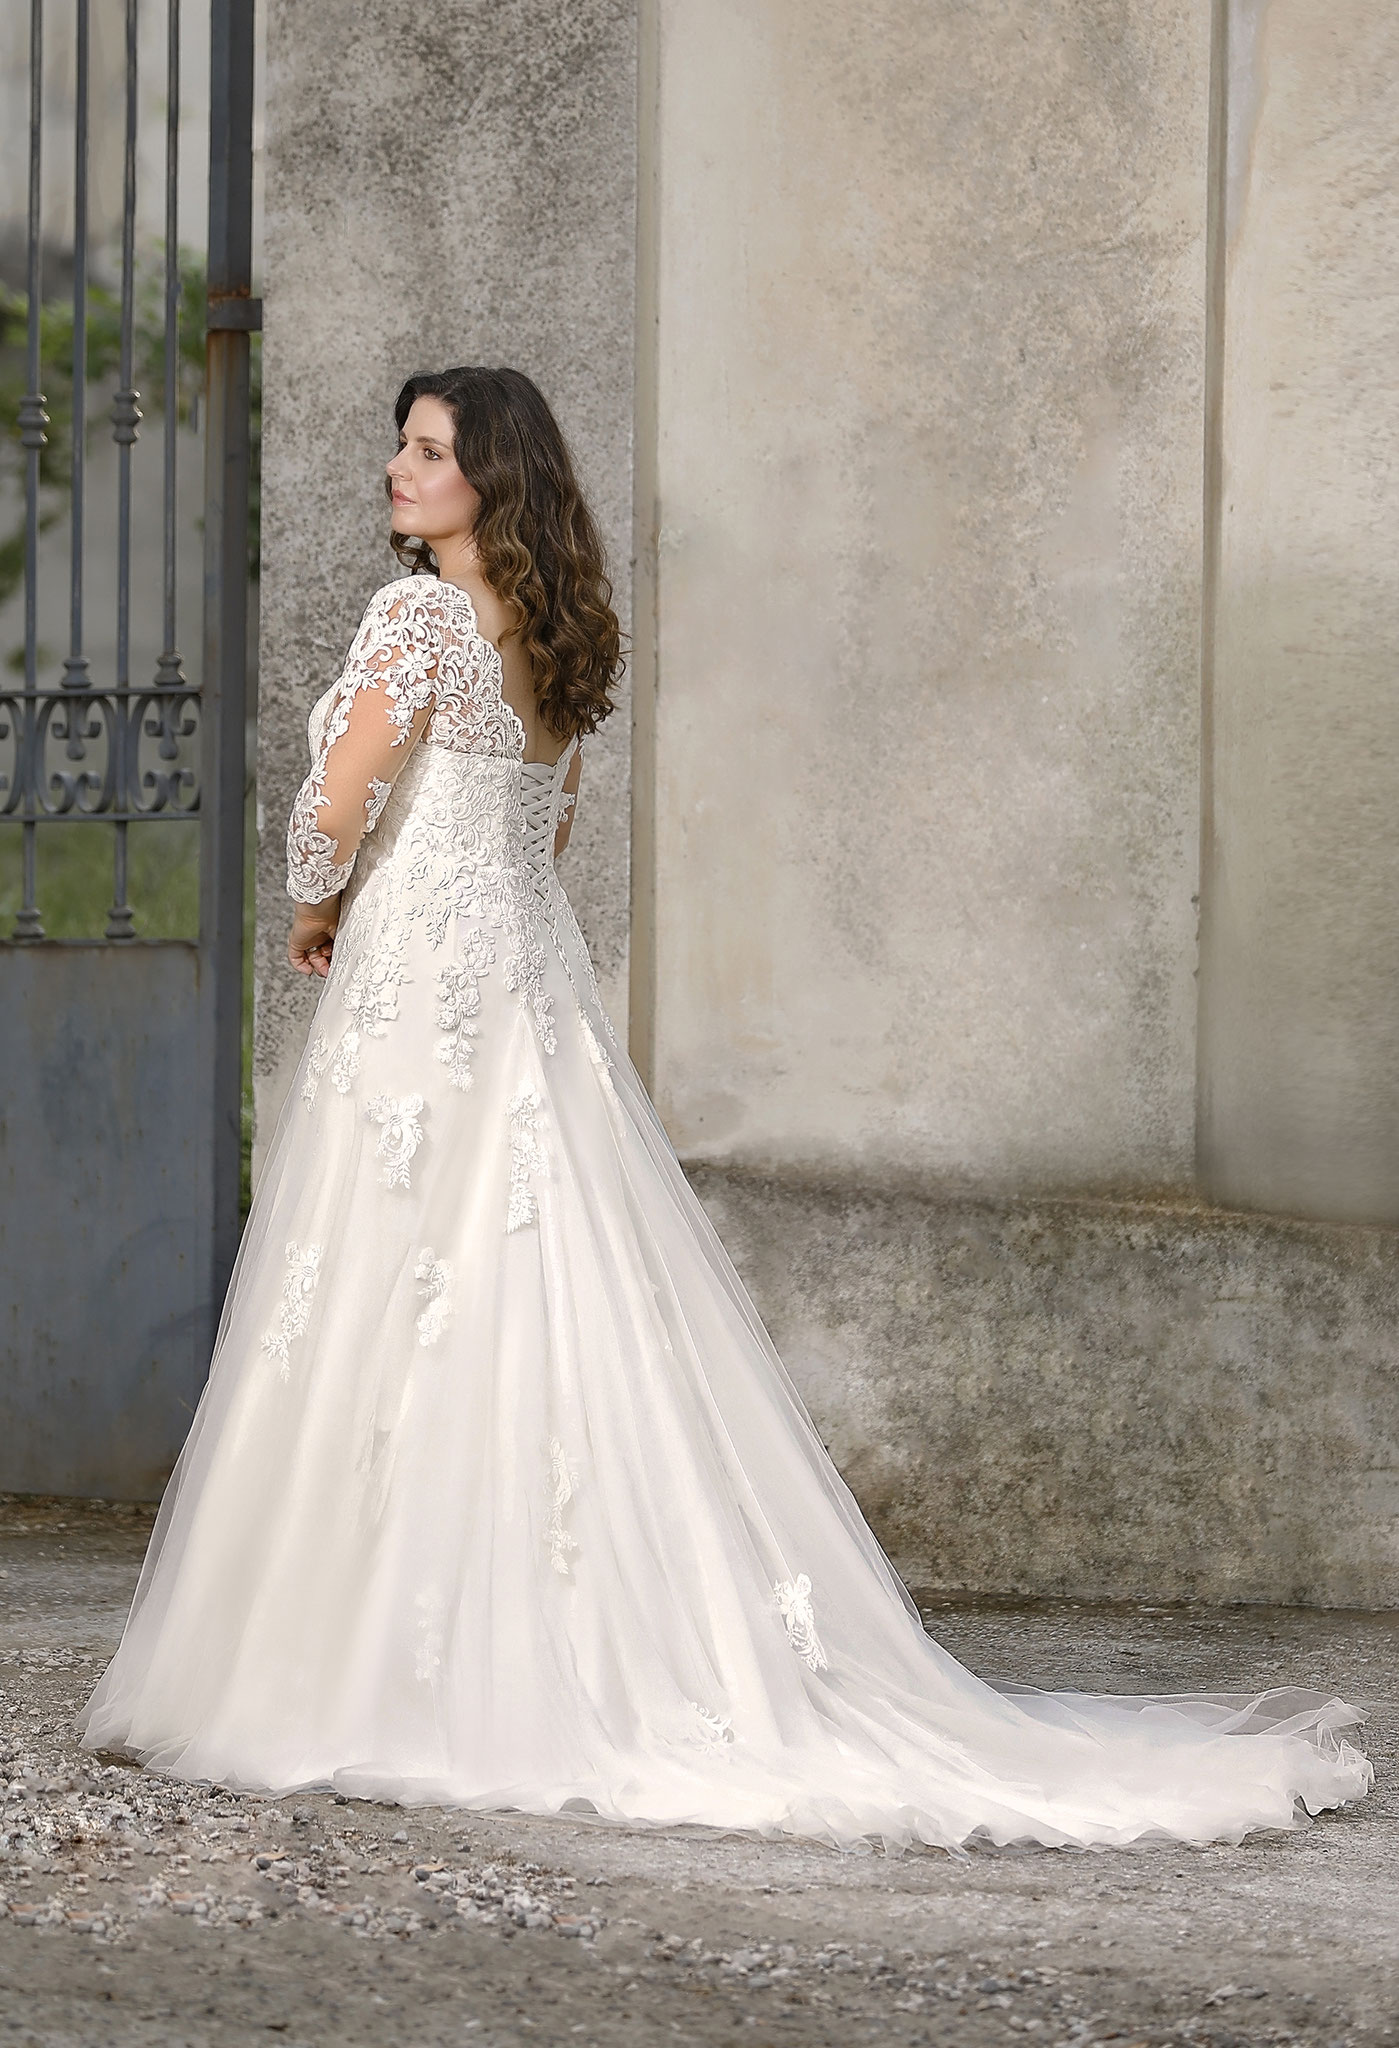 lange Arme Alemie Schnürung myLovely München Weddingdress Schleppe Spitze Glitzer Curvey